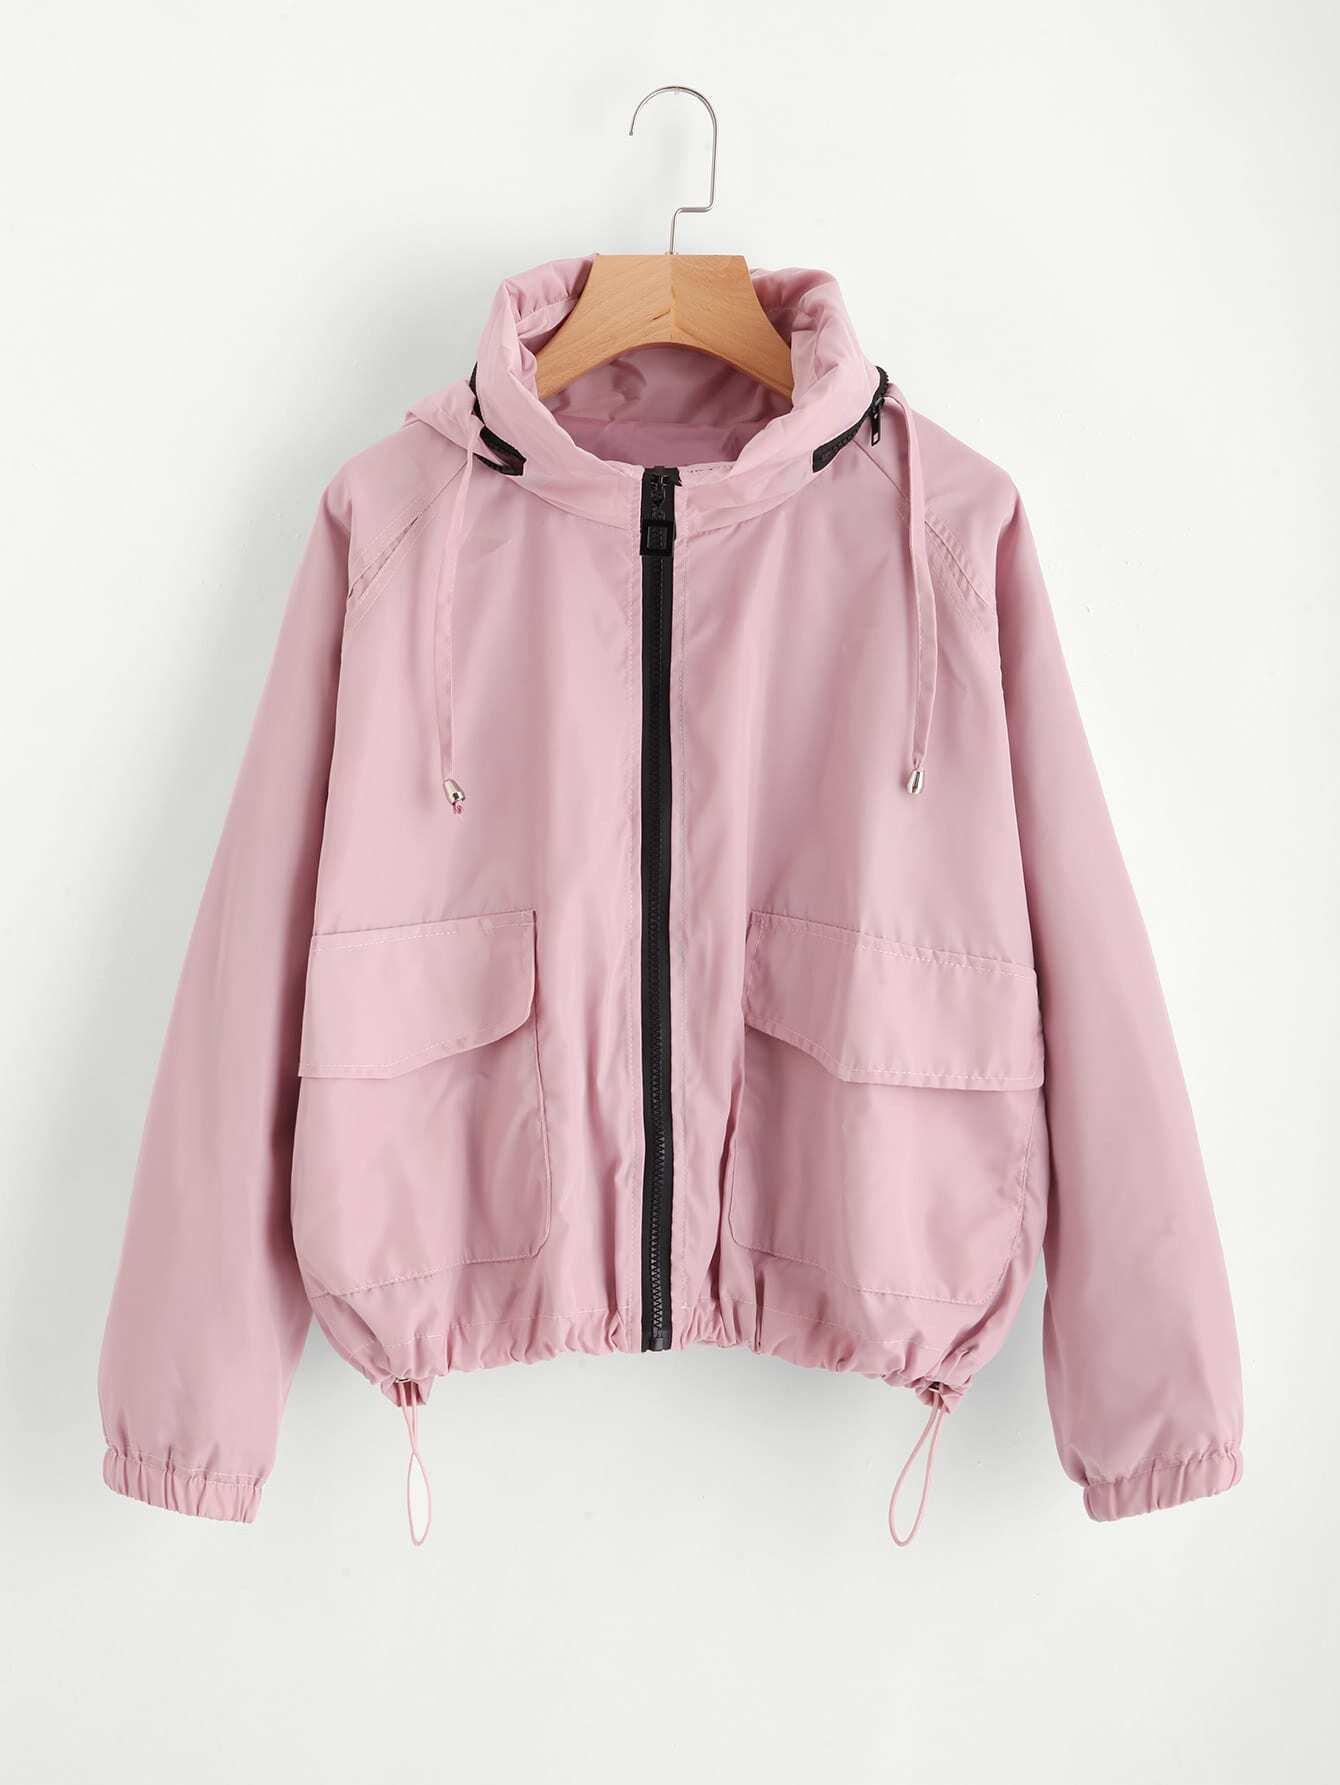 Flap Pocket Front Drawstring Hem Hooded Jacket tree print drawstring hem hooded blouse